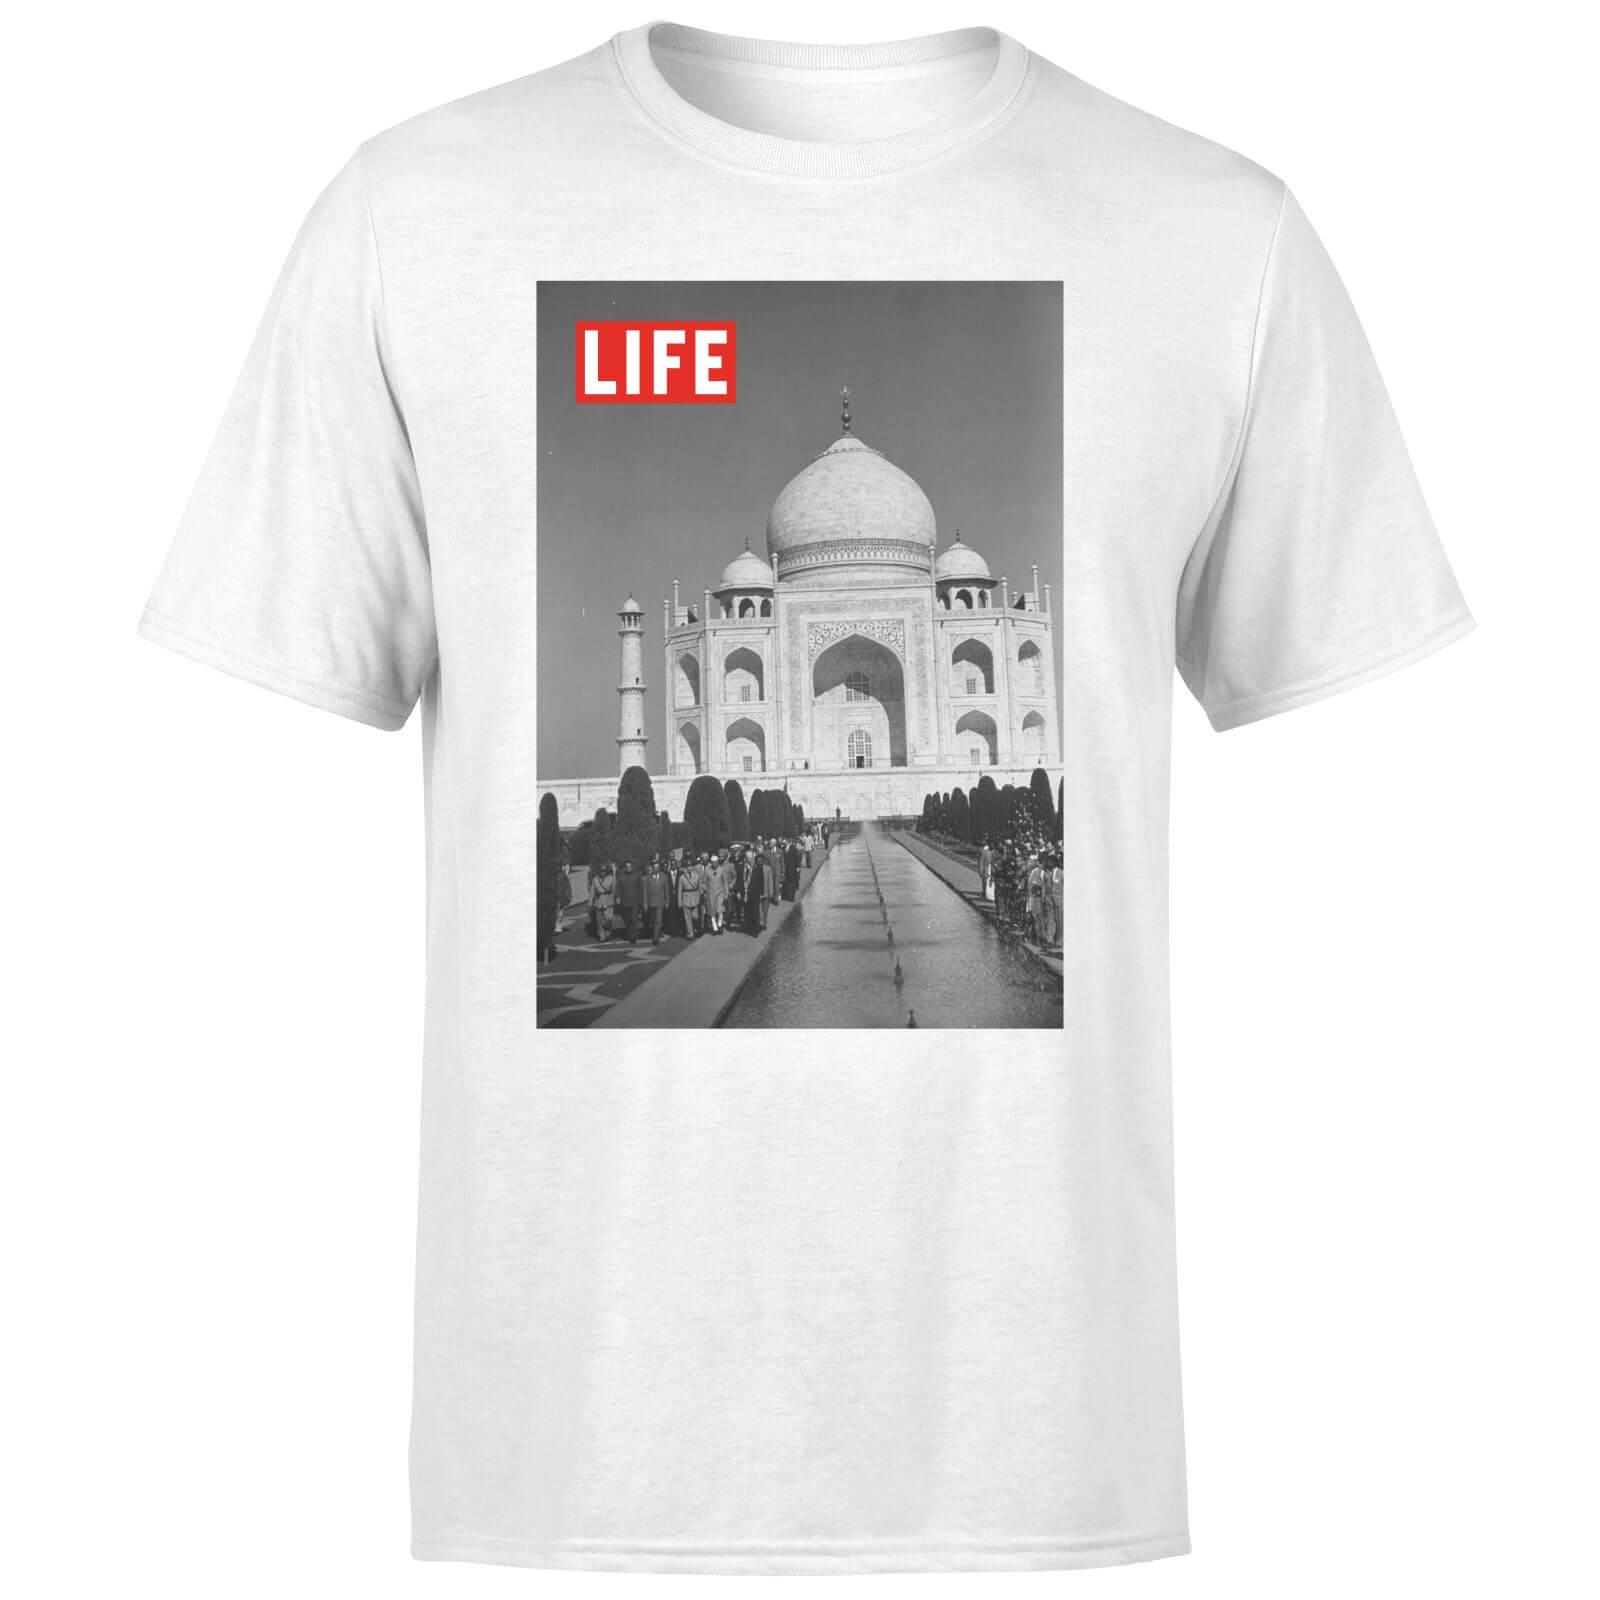 LIFE Magazine Taj Mahal Men's T-Shirt - White - L - White-male